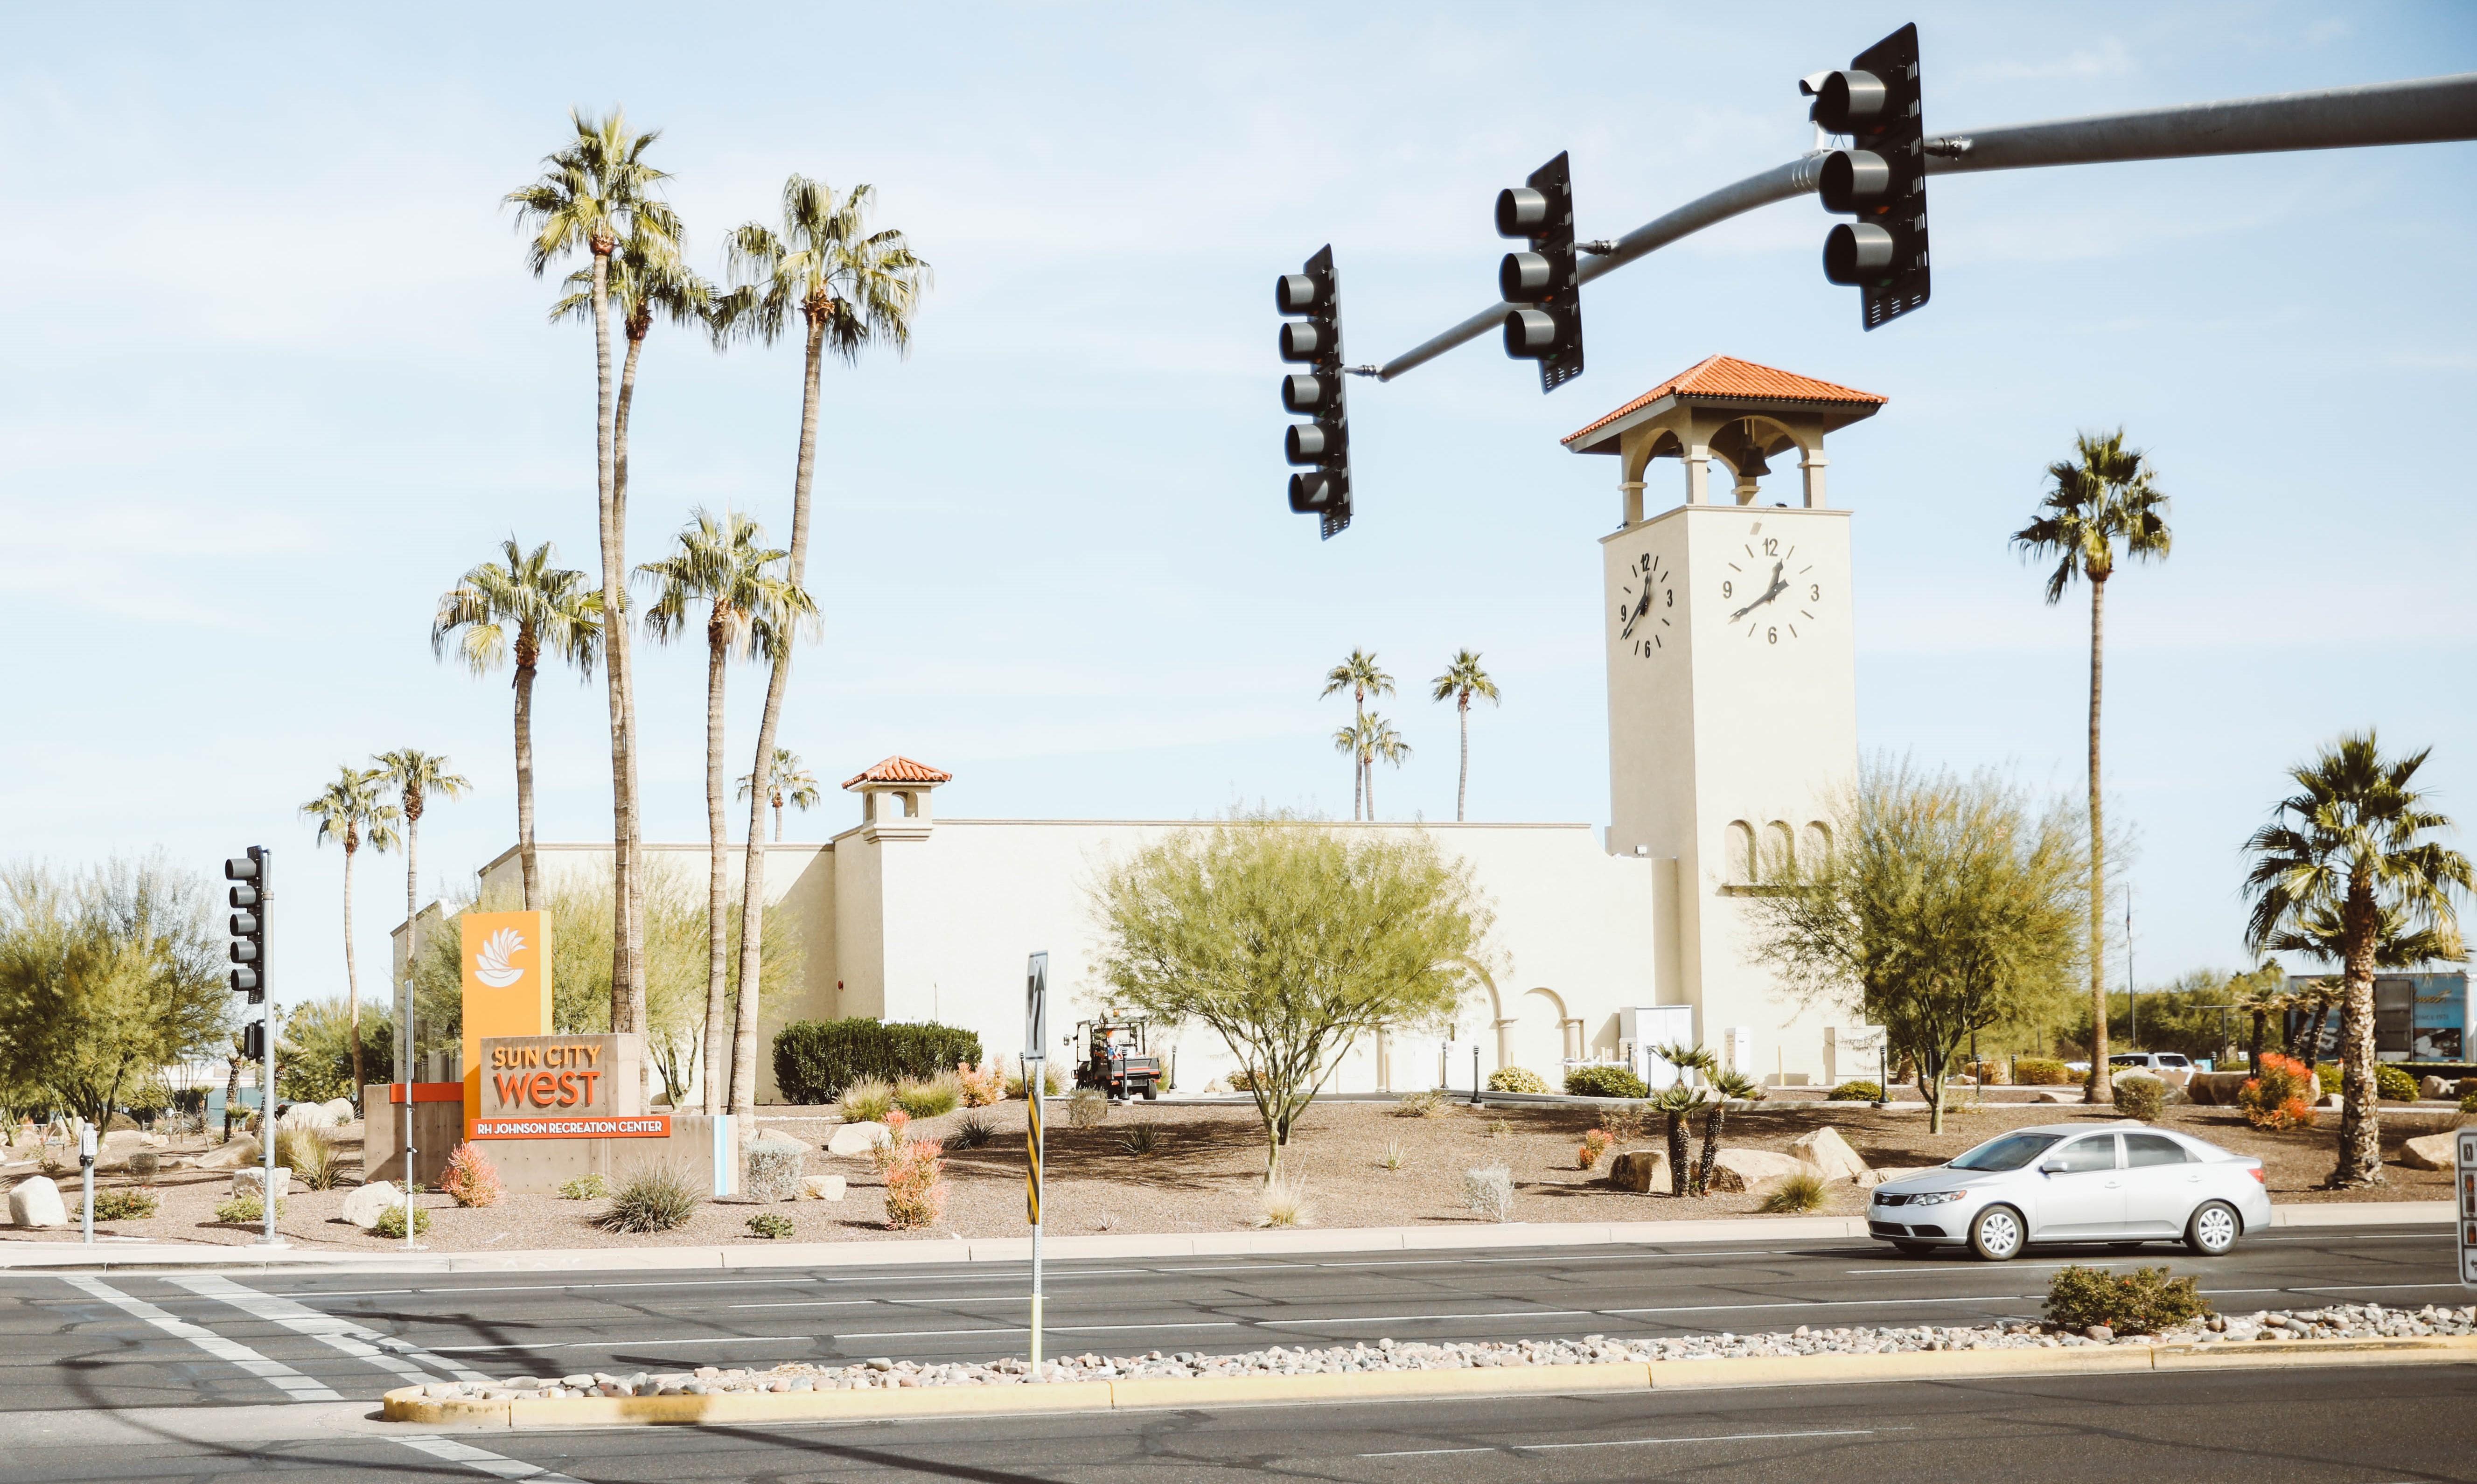 Sun City West Recreation Center from across the street